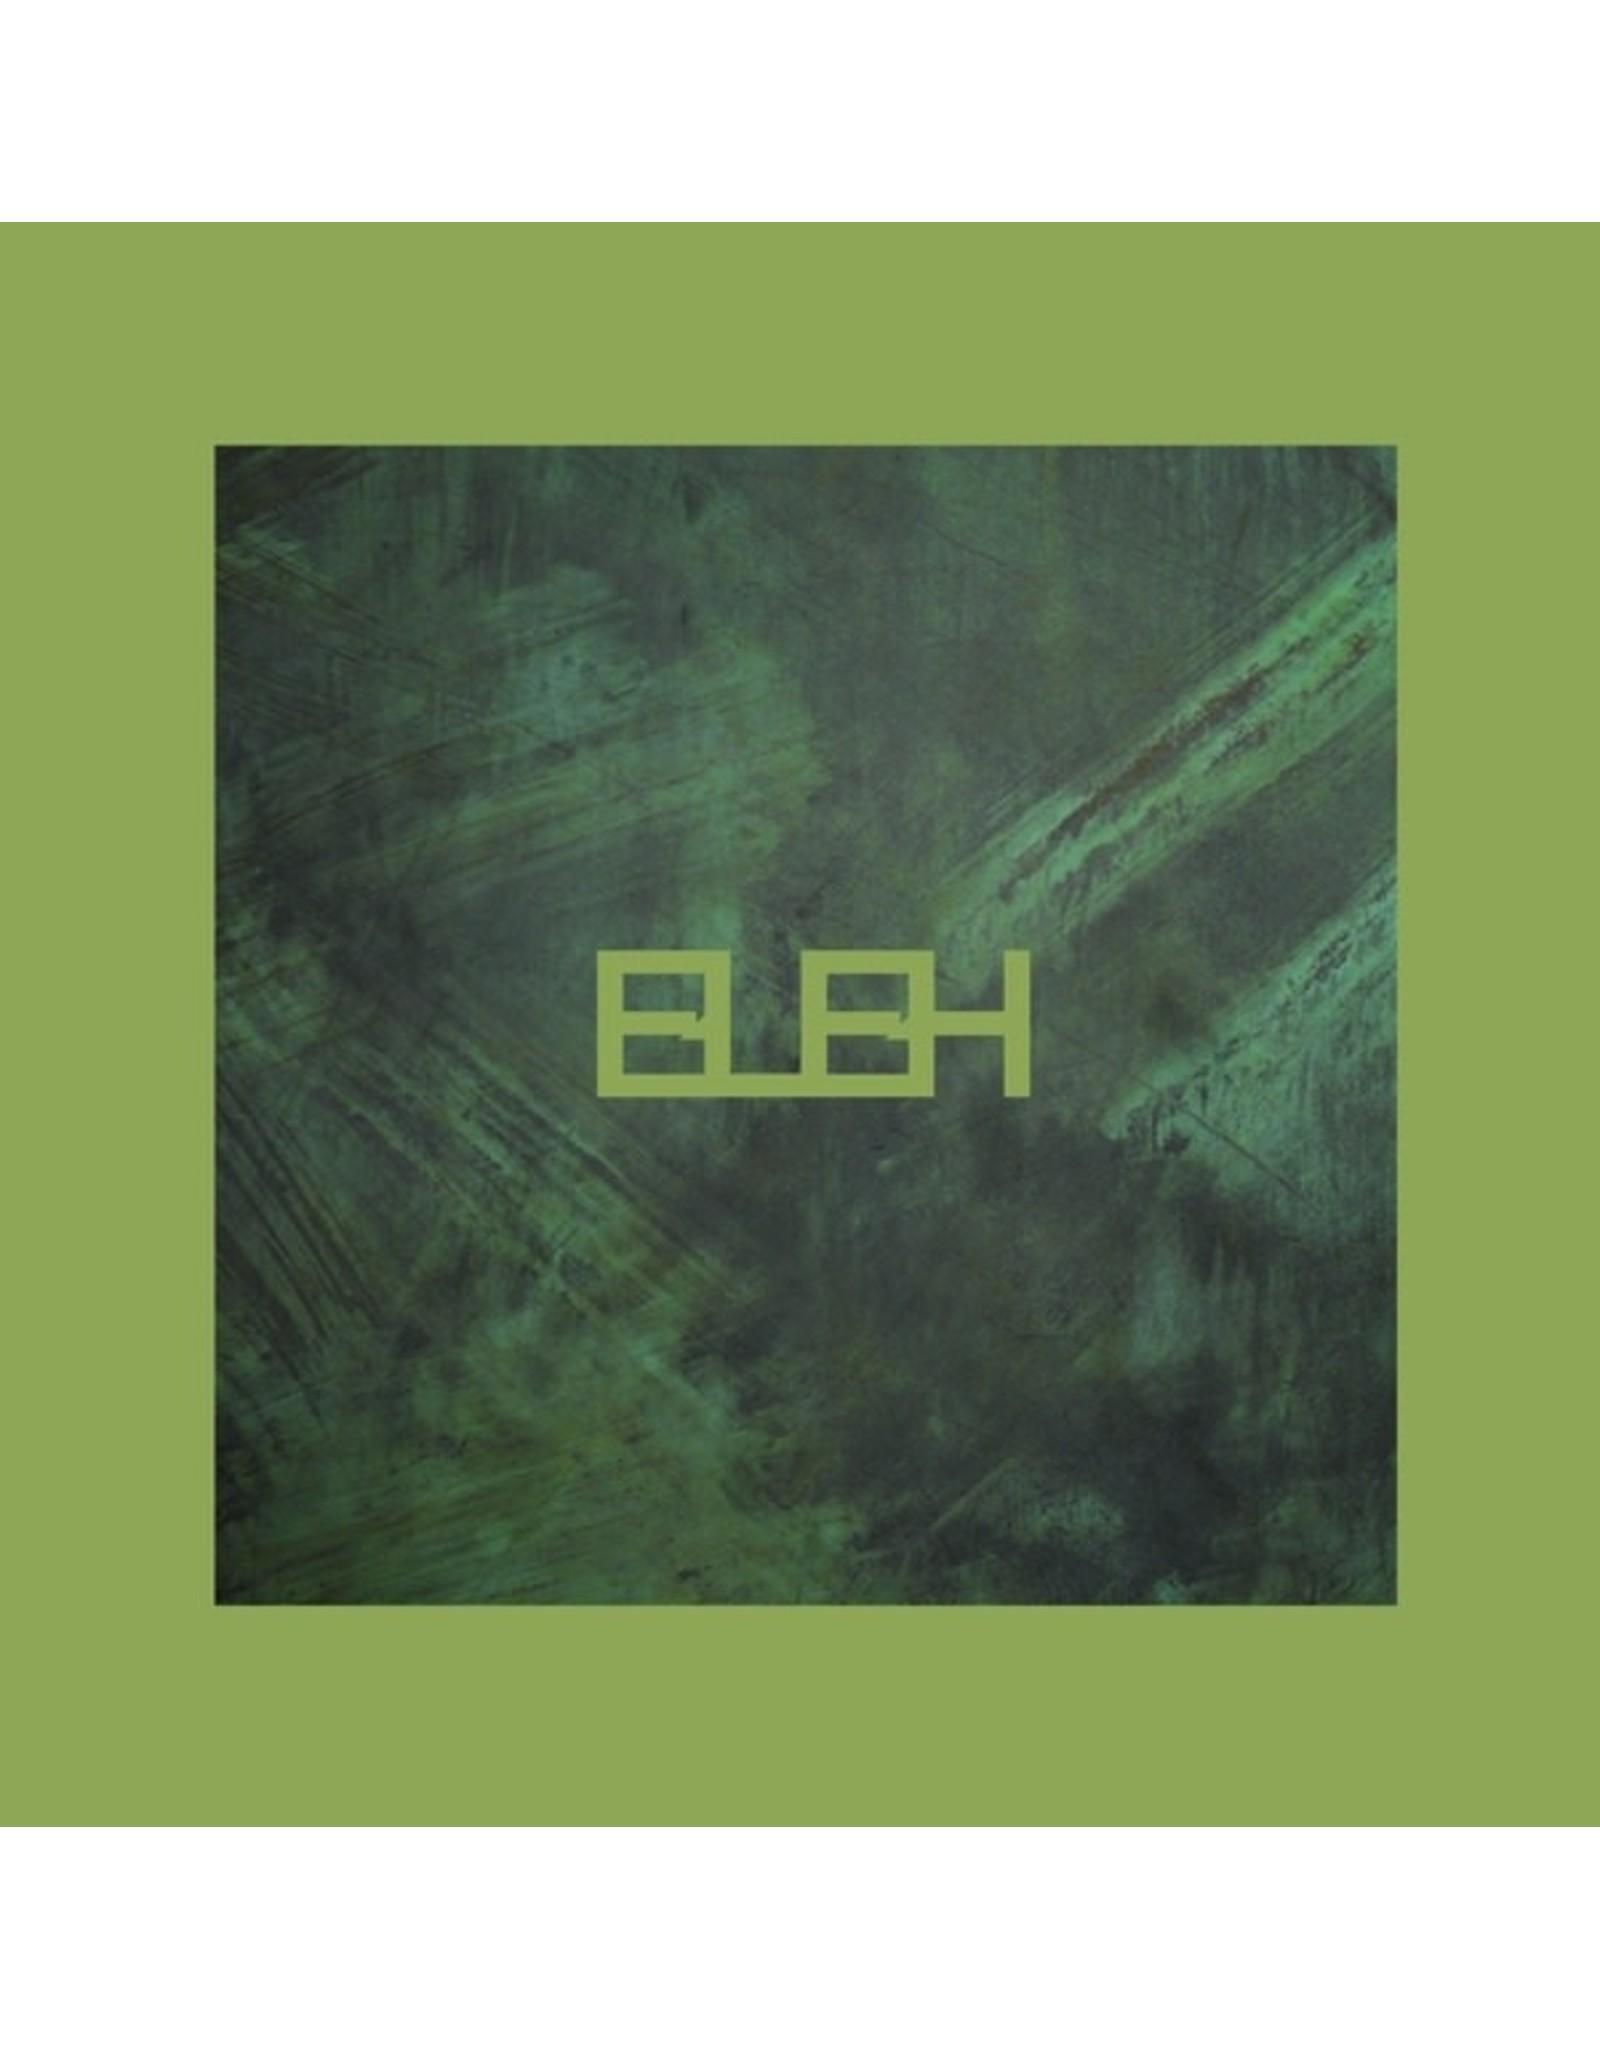 Important Eleh: Harmonic Twins LP